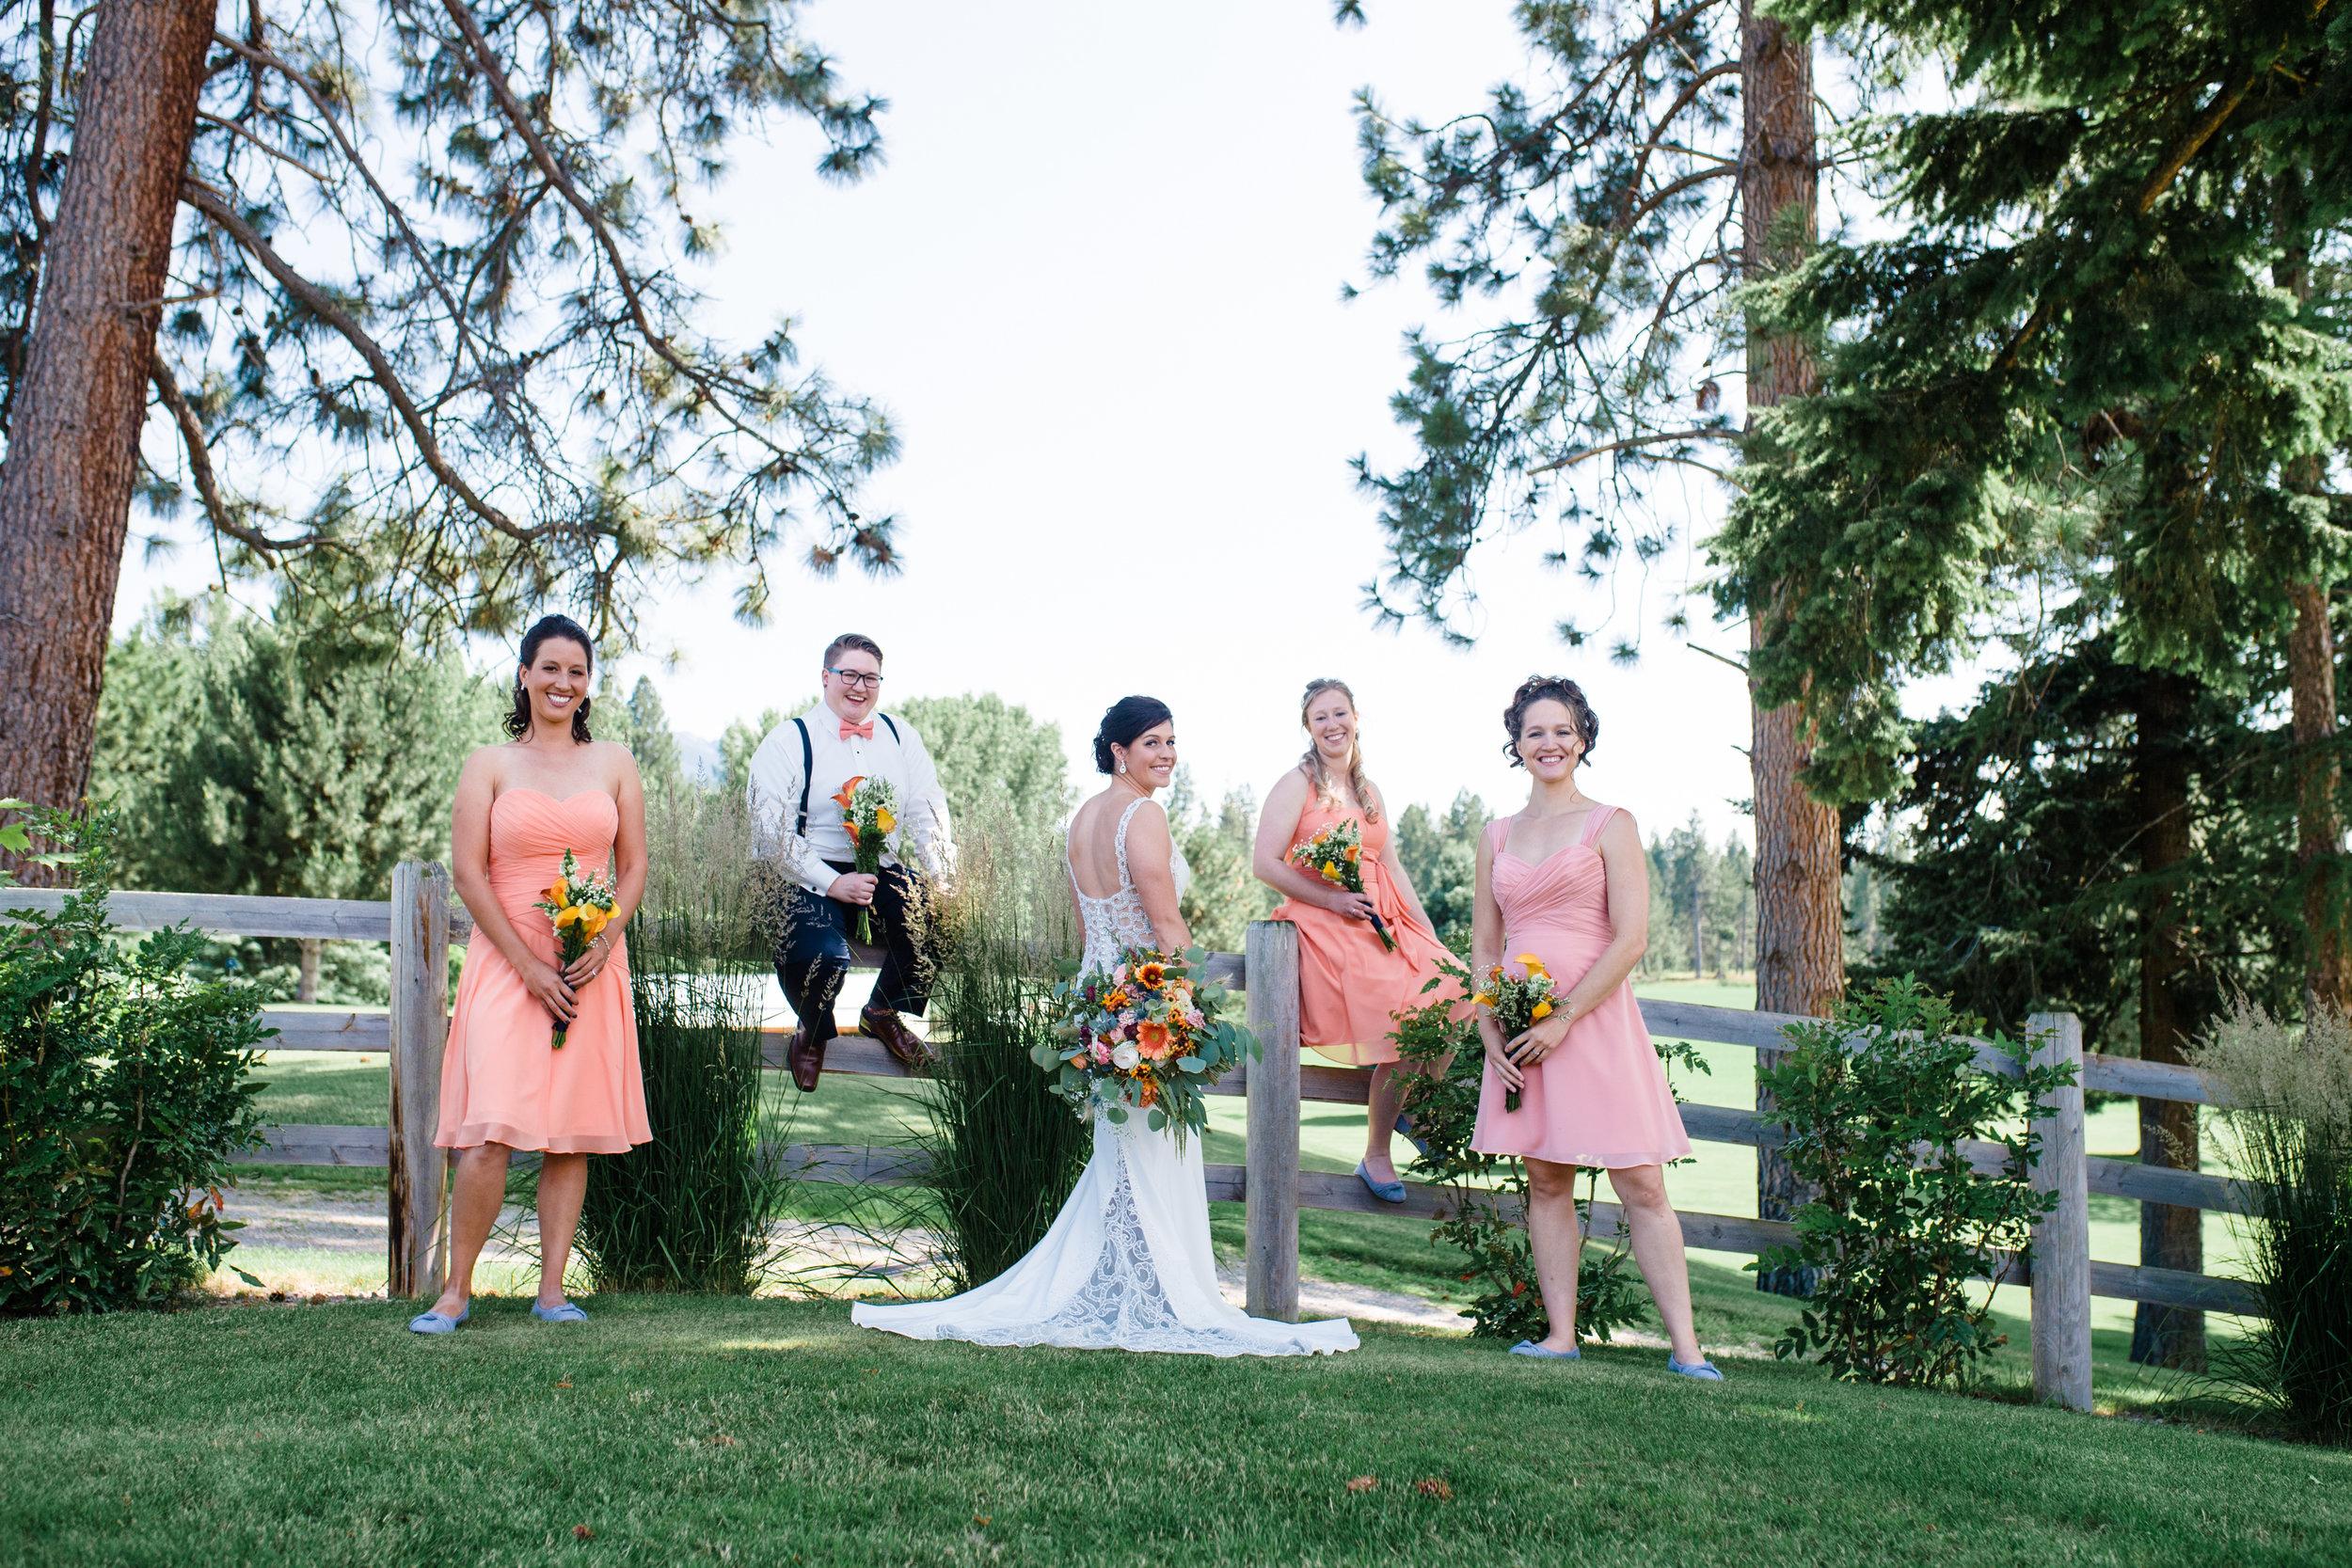 014The Barn at Finley Point Wedding_Montana Wedding Photographer_Katy & Bryce_July 20, 2019-48.jpg